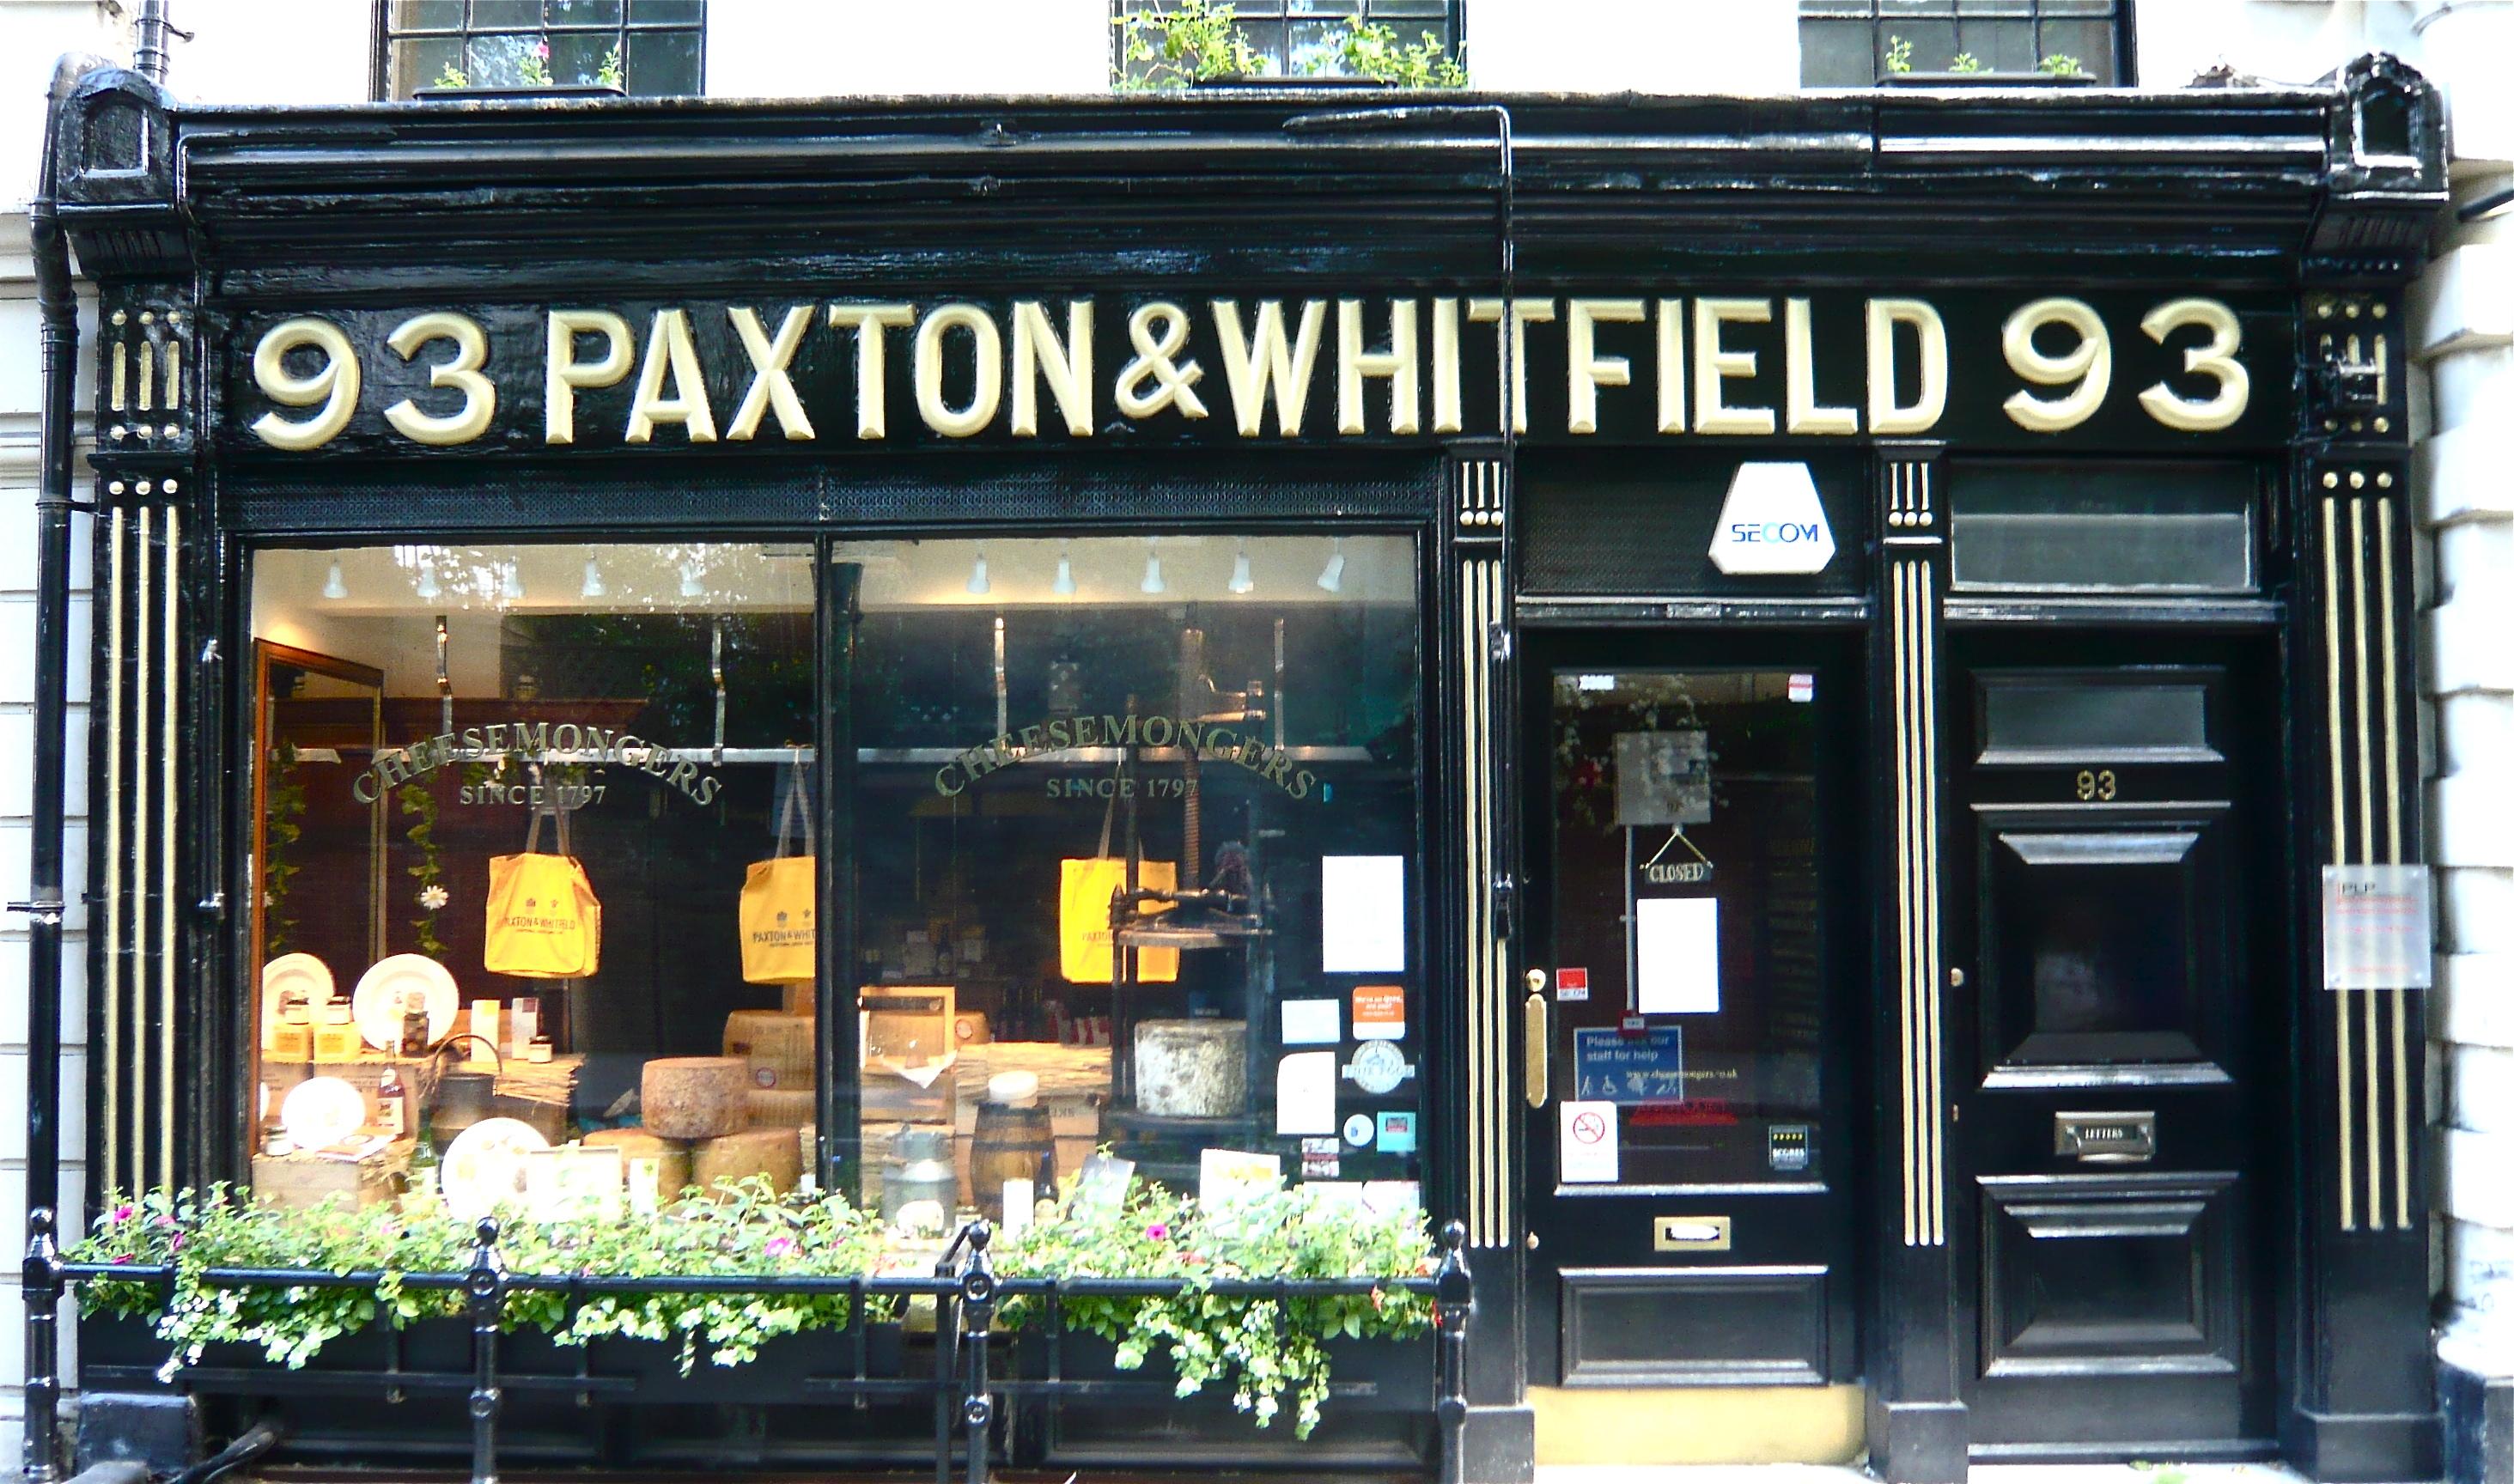 Paxton_%26_Whitfield_Jermyn_Street.jpg